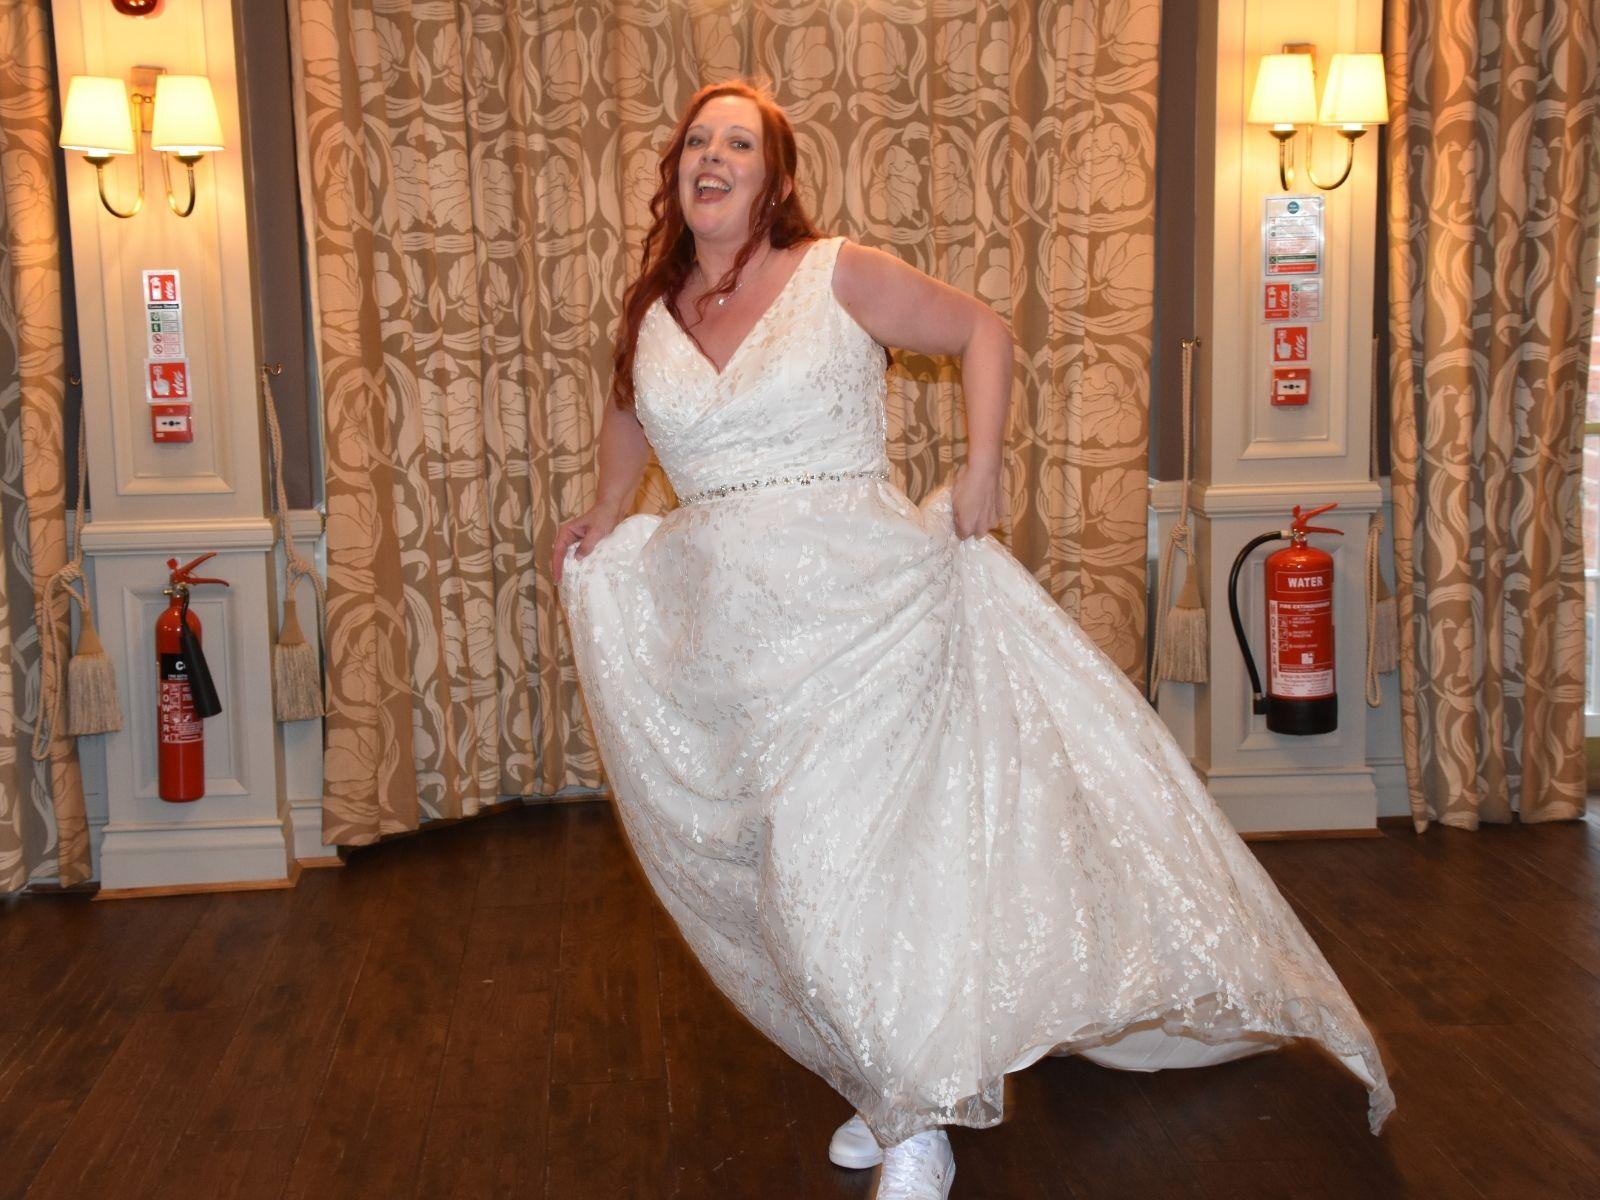 Millie May full length wedding dress